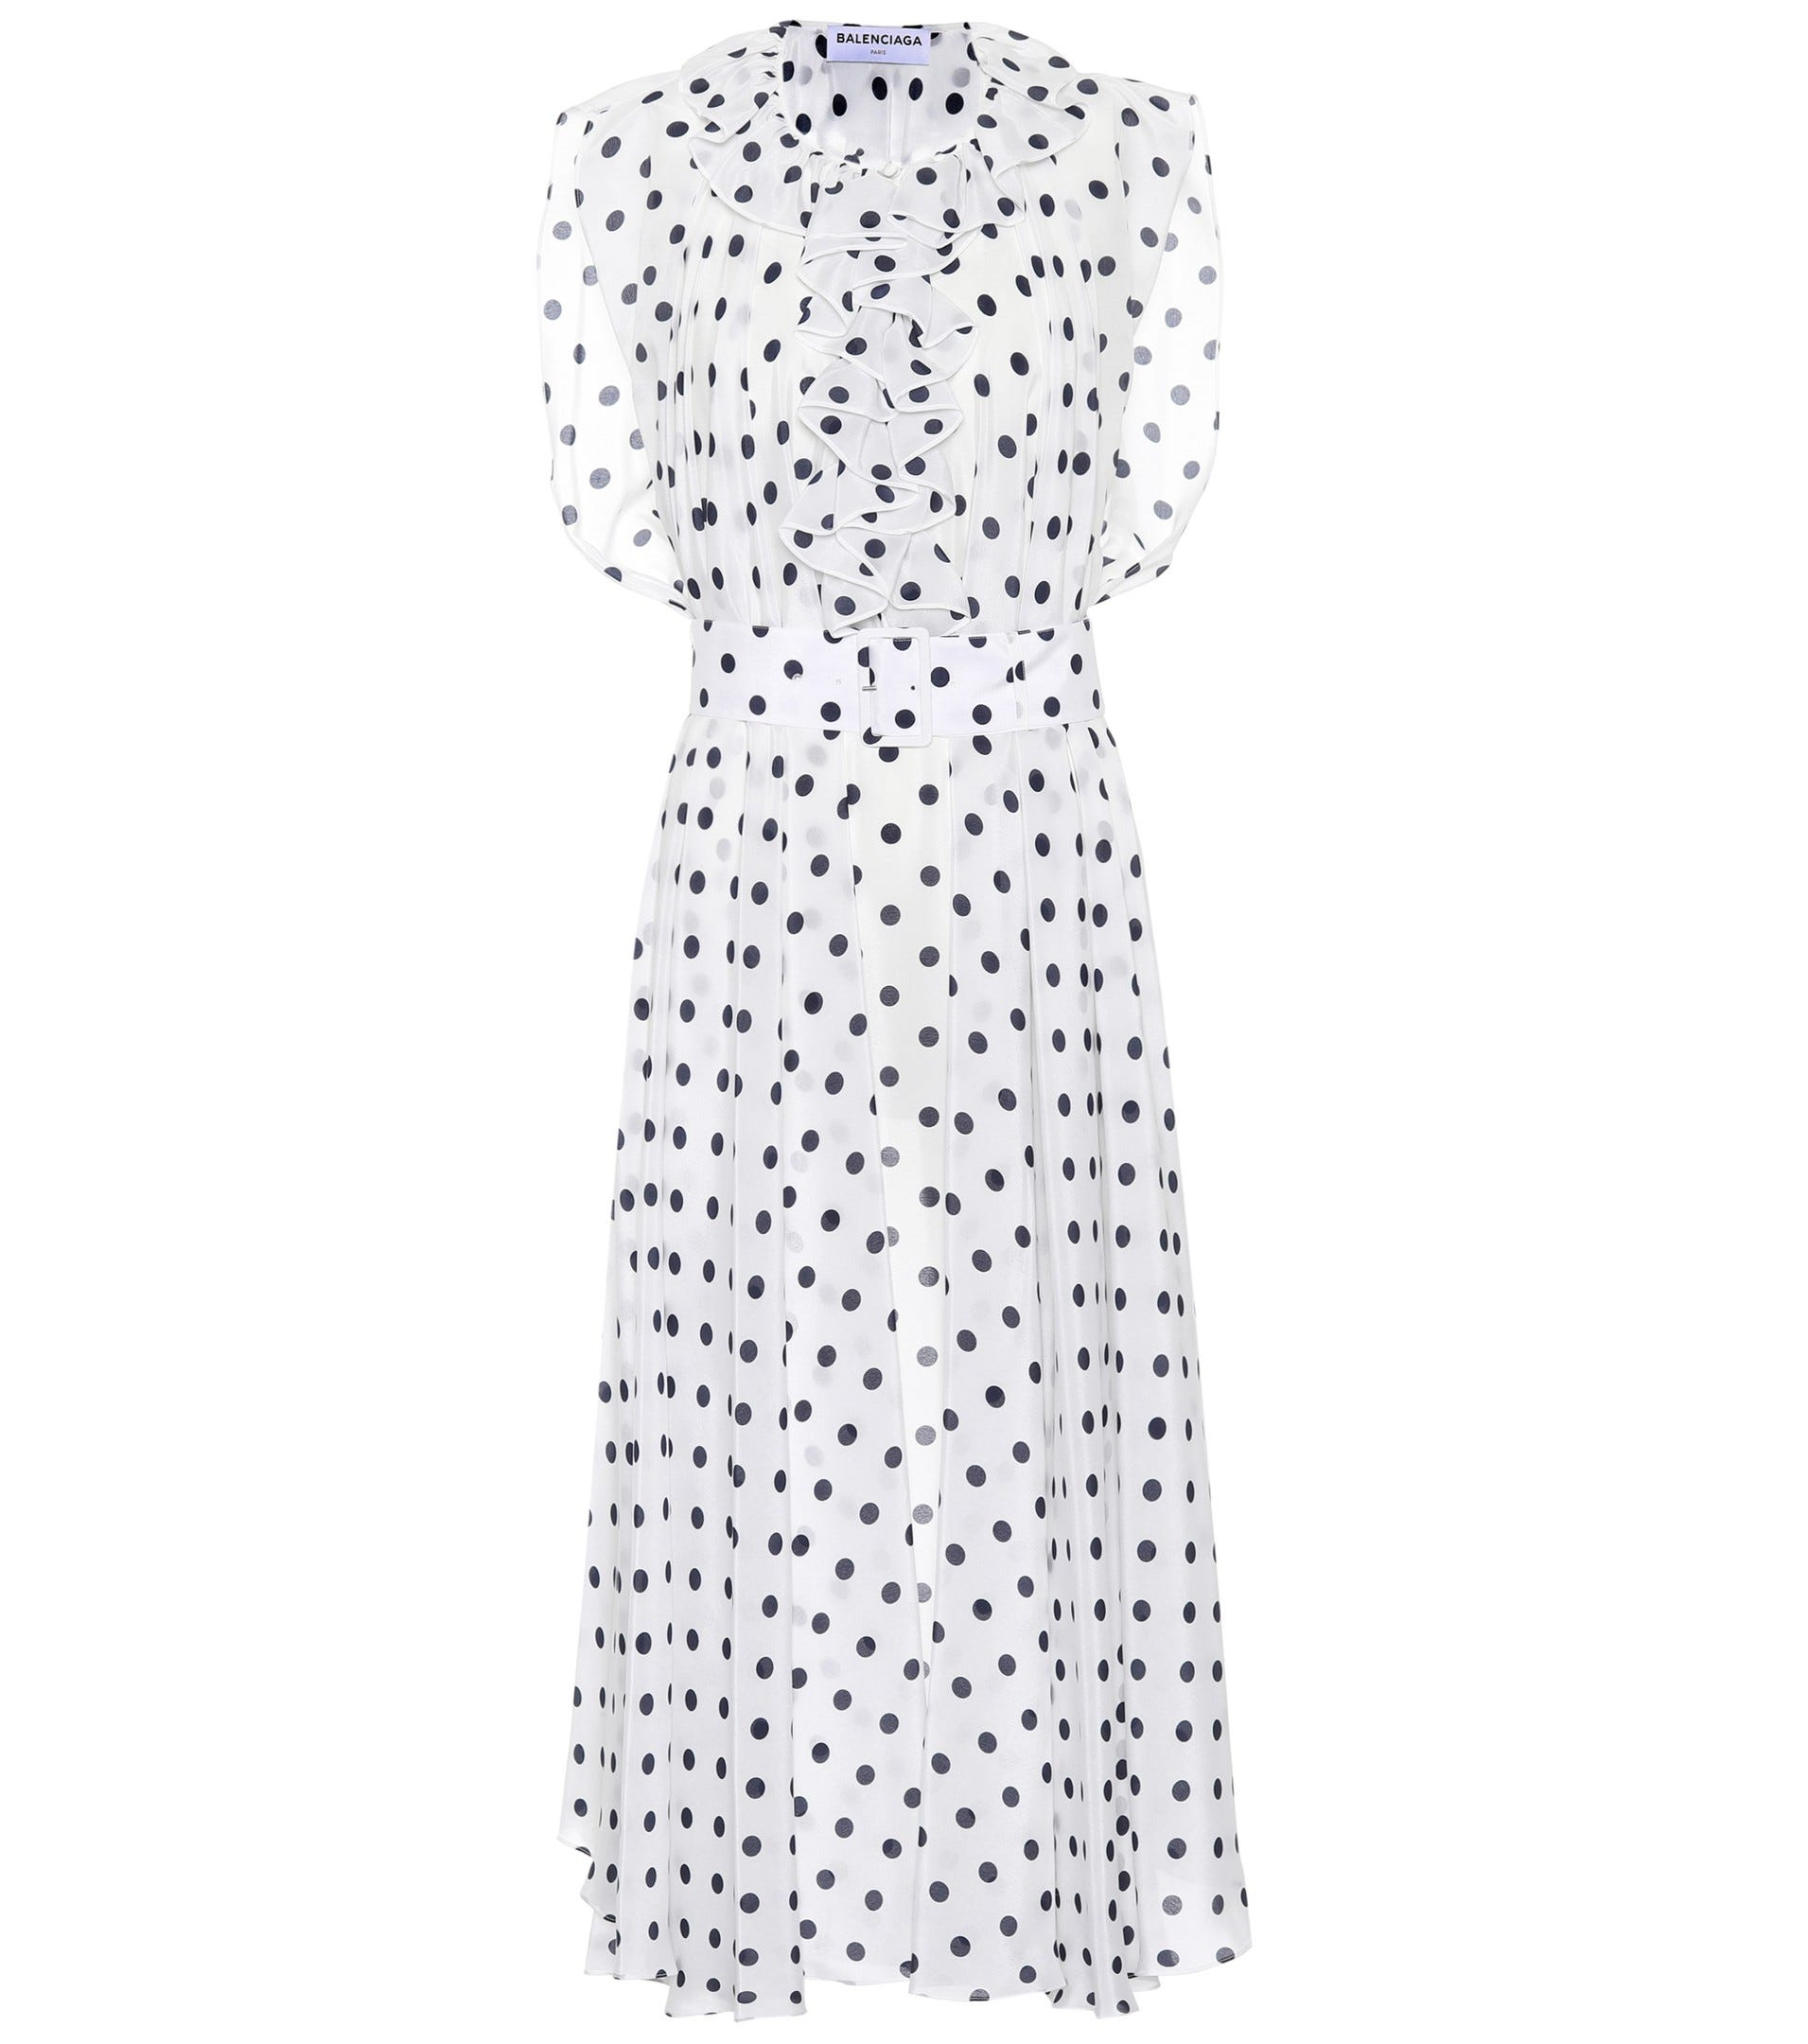 a04cfea8c8f8 Cute Ways To Wear The Polka Dot Trend Winter 2018